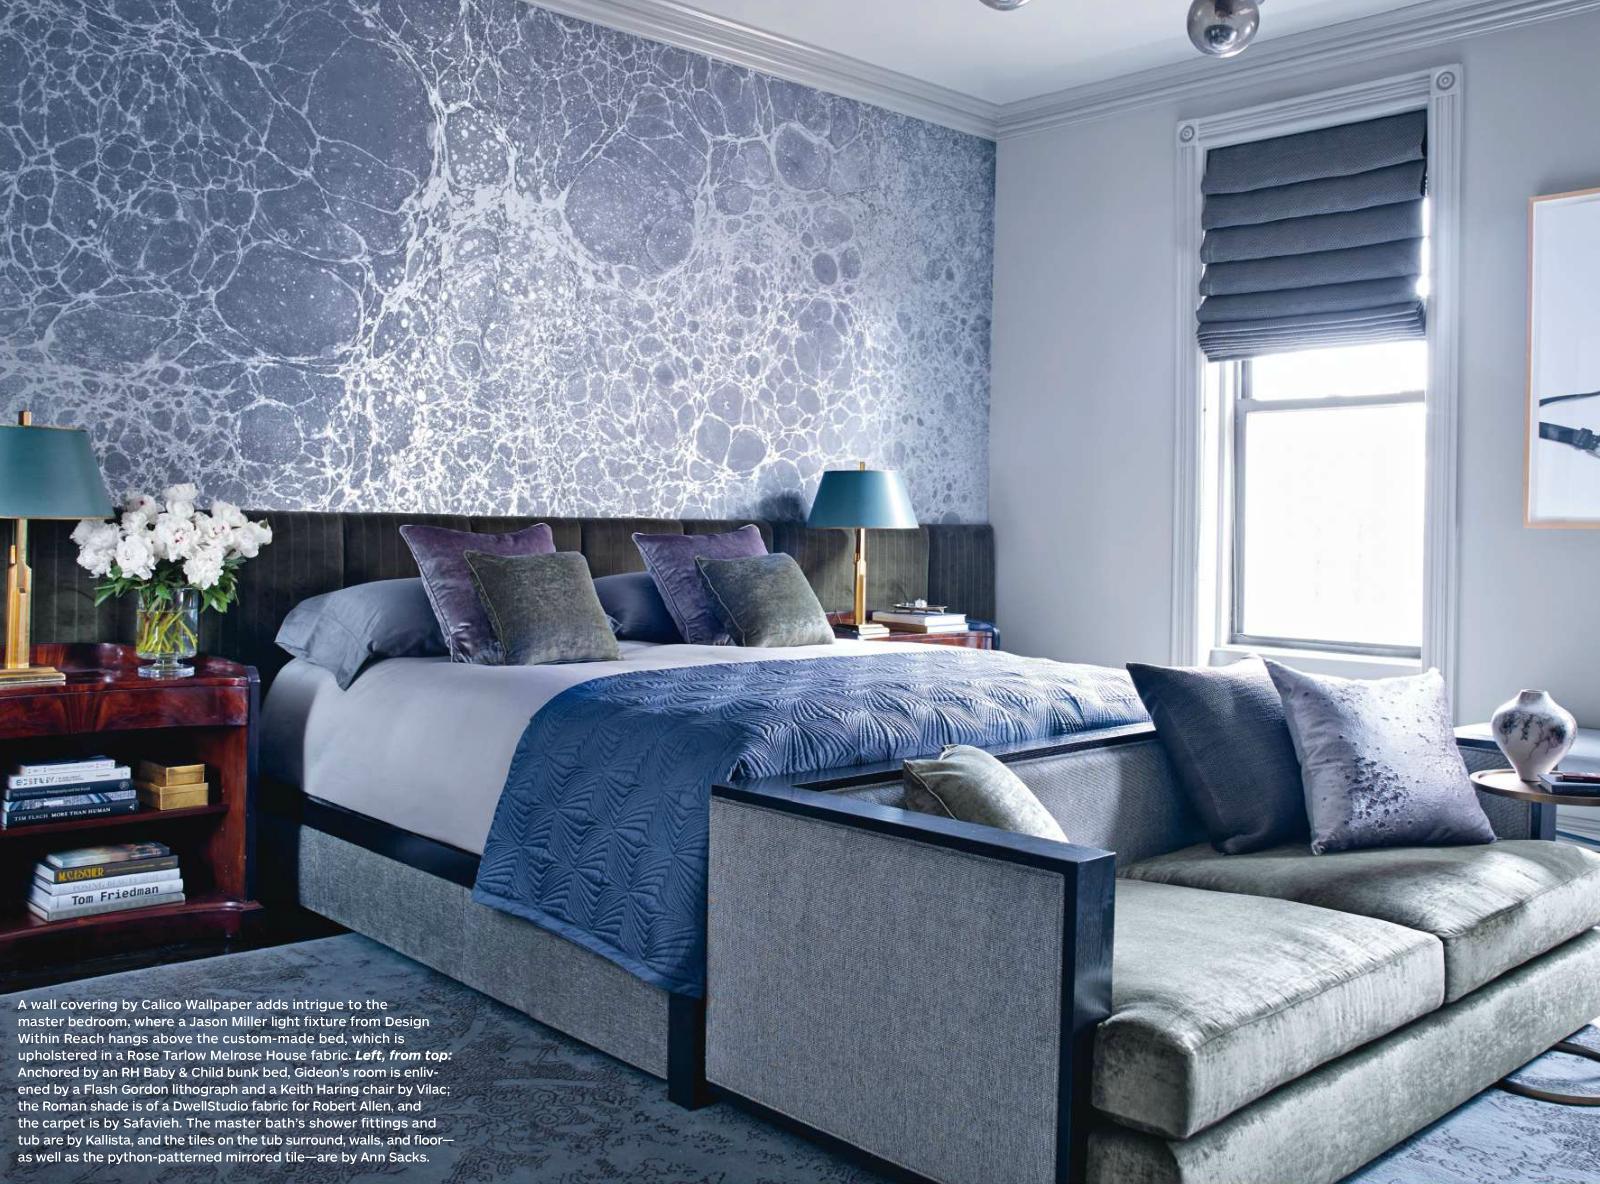 Trace Lenhoff Luxurious Bedrooms Celebrity Bedrooms Luxury